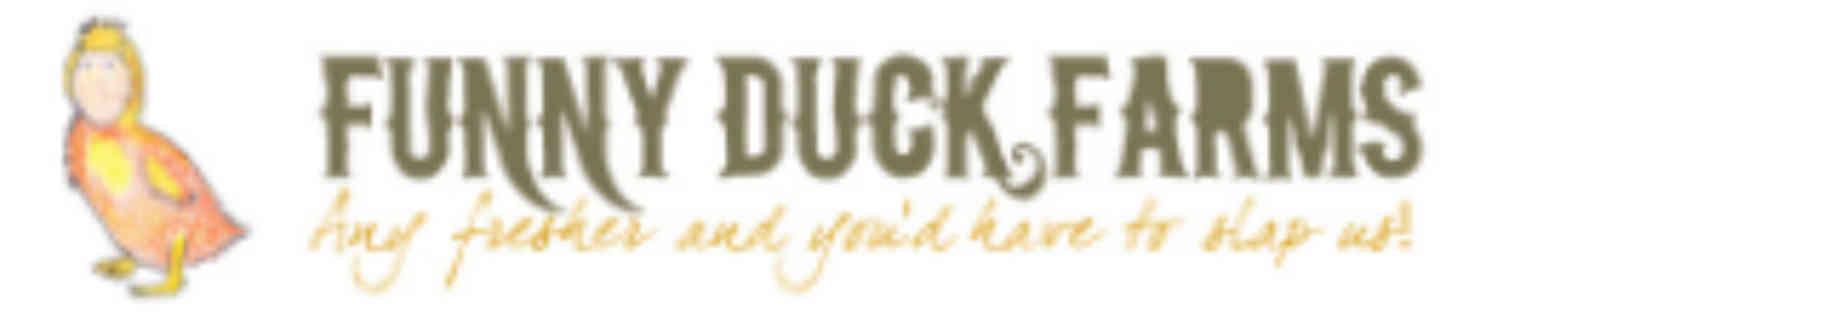 Fermier de famille logo Funny Duck Farms Jasper Ulocal produit local achat local